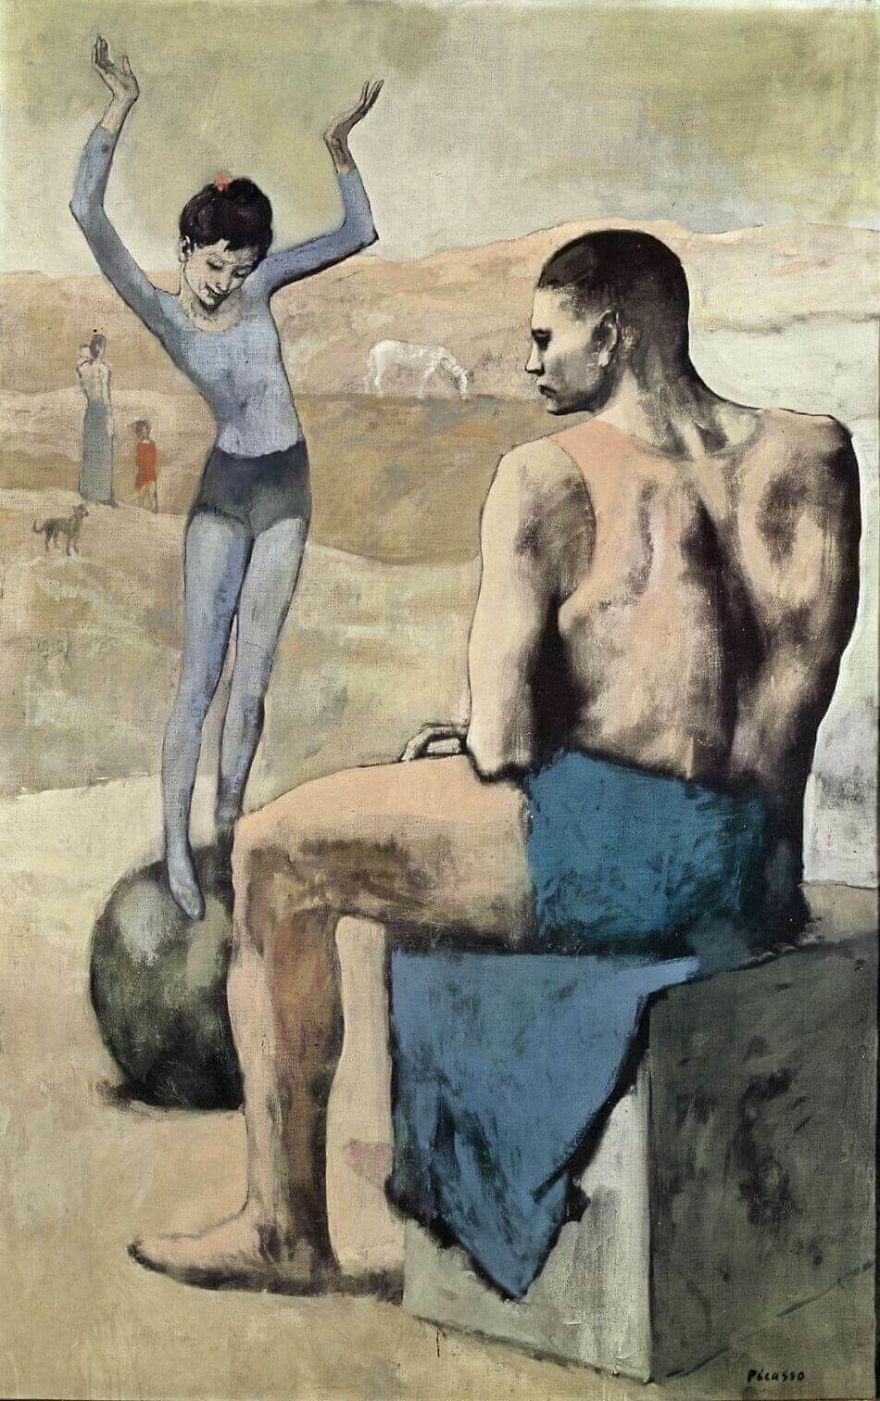 Detaliile ascunse ale picturilor celebre, in ilustratii haioase - Poza 5